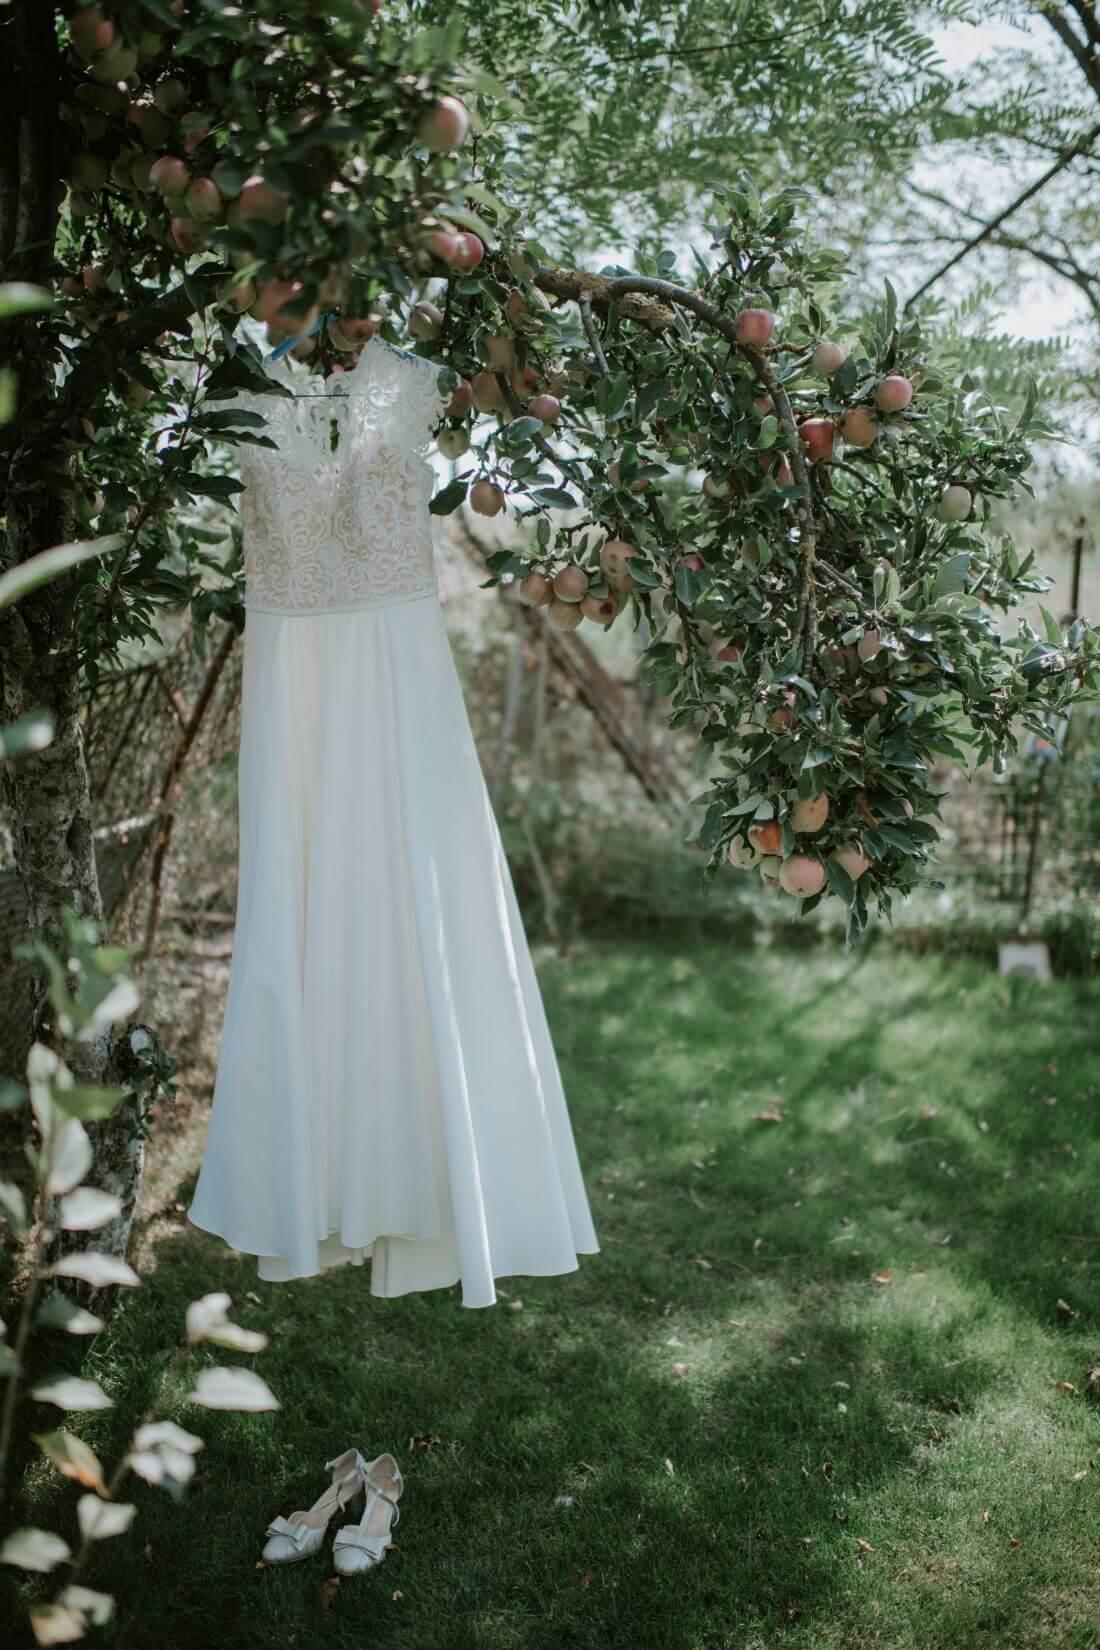 Nunta cu multe calatorii si farfurii – Alexandra si Catalin – IDO-Weddings-nuntiinaerliber (2)